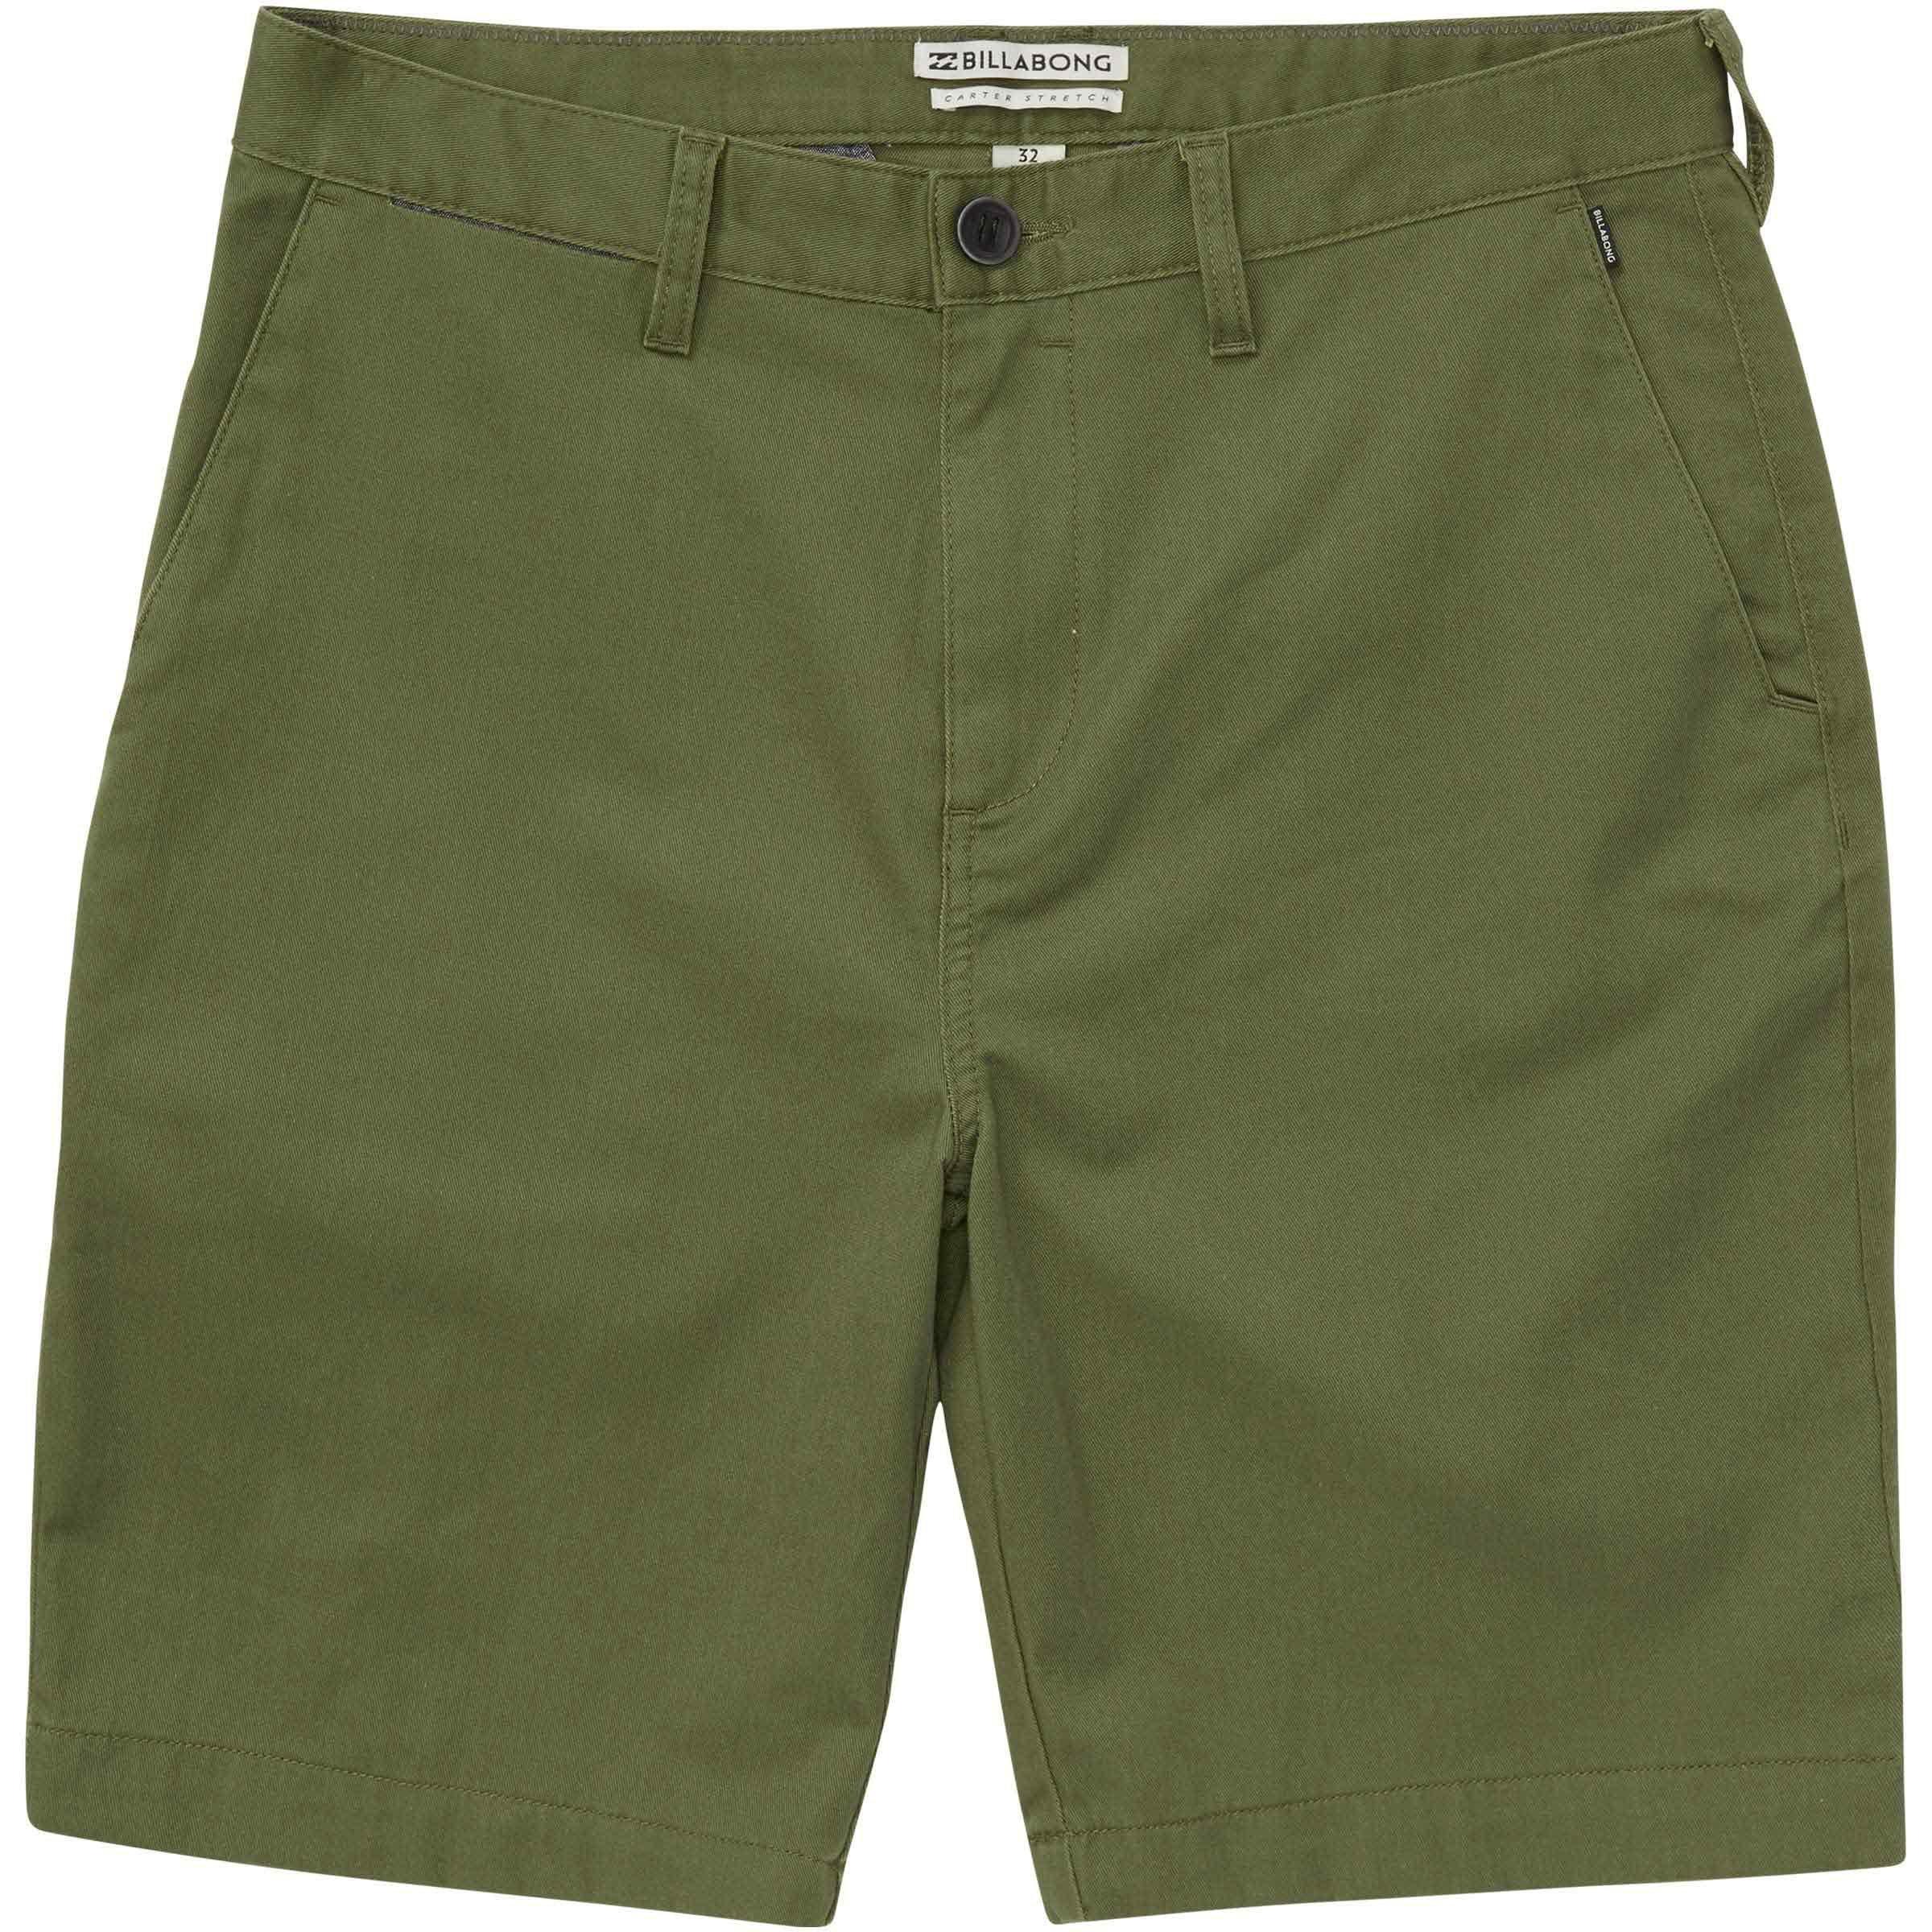 Billabong Boys' Carter Stretch Shorts Agave 3T